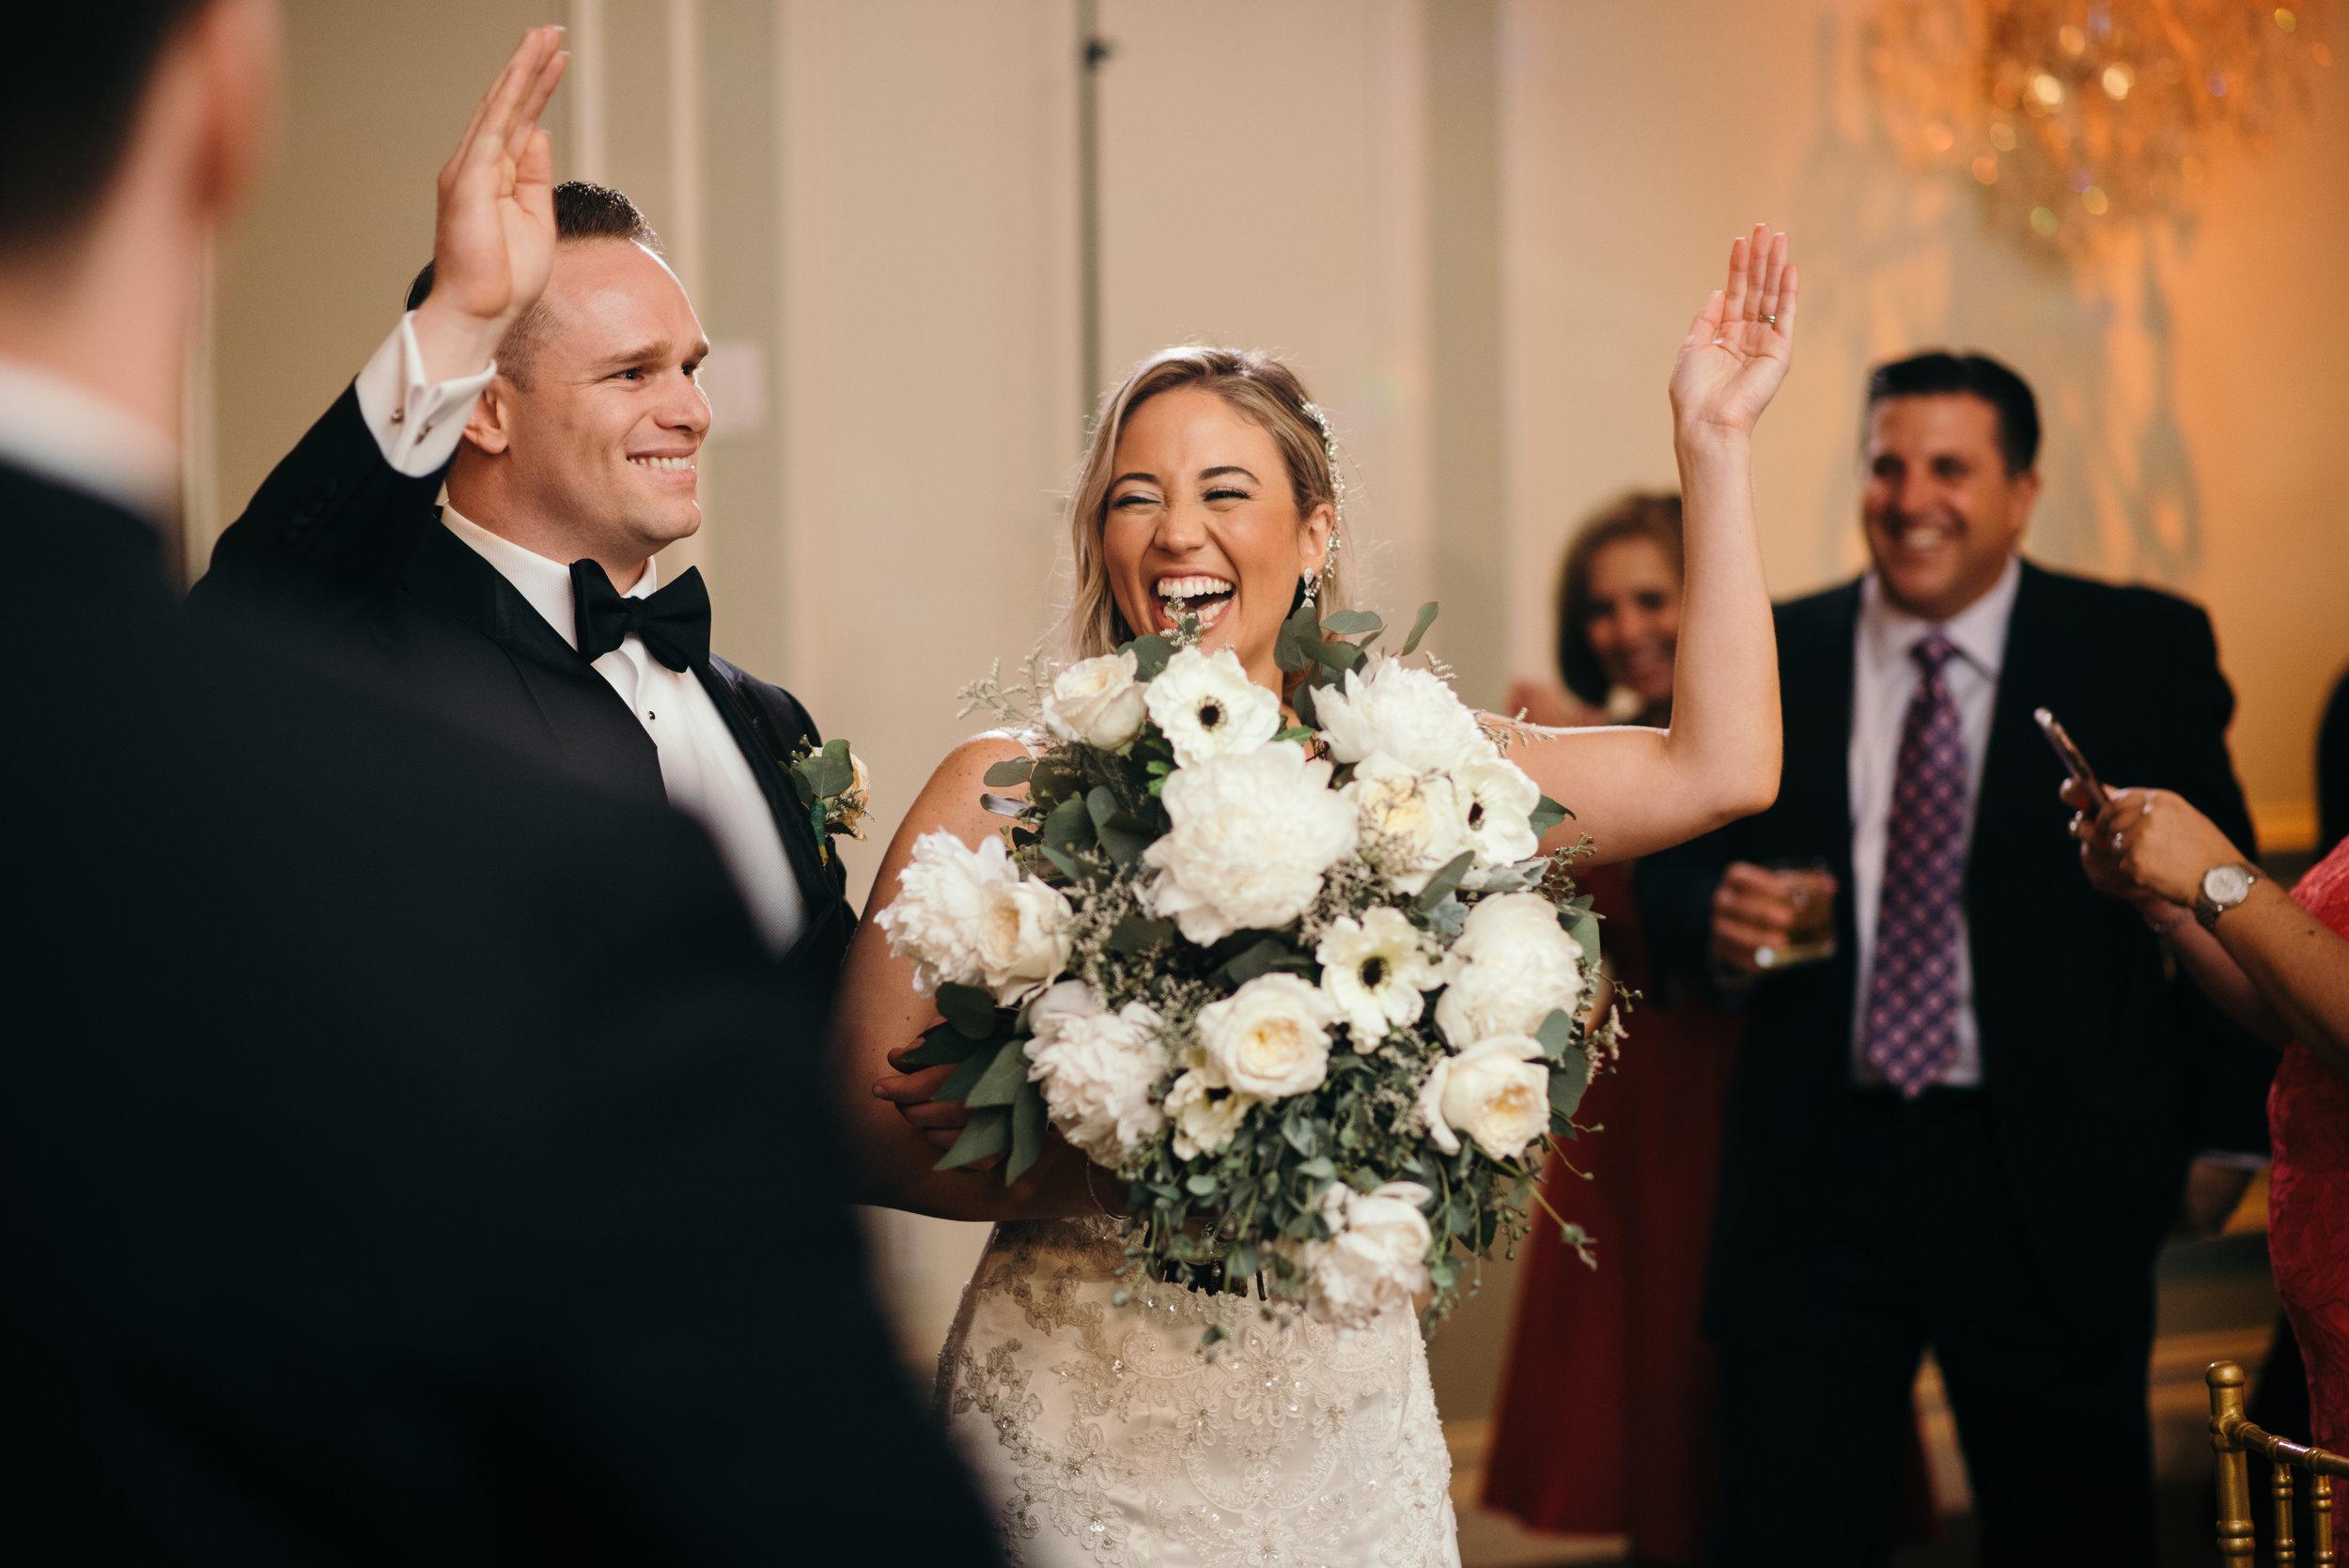 The Rockleigh Wedding NJ_66.jpg